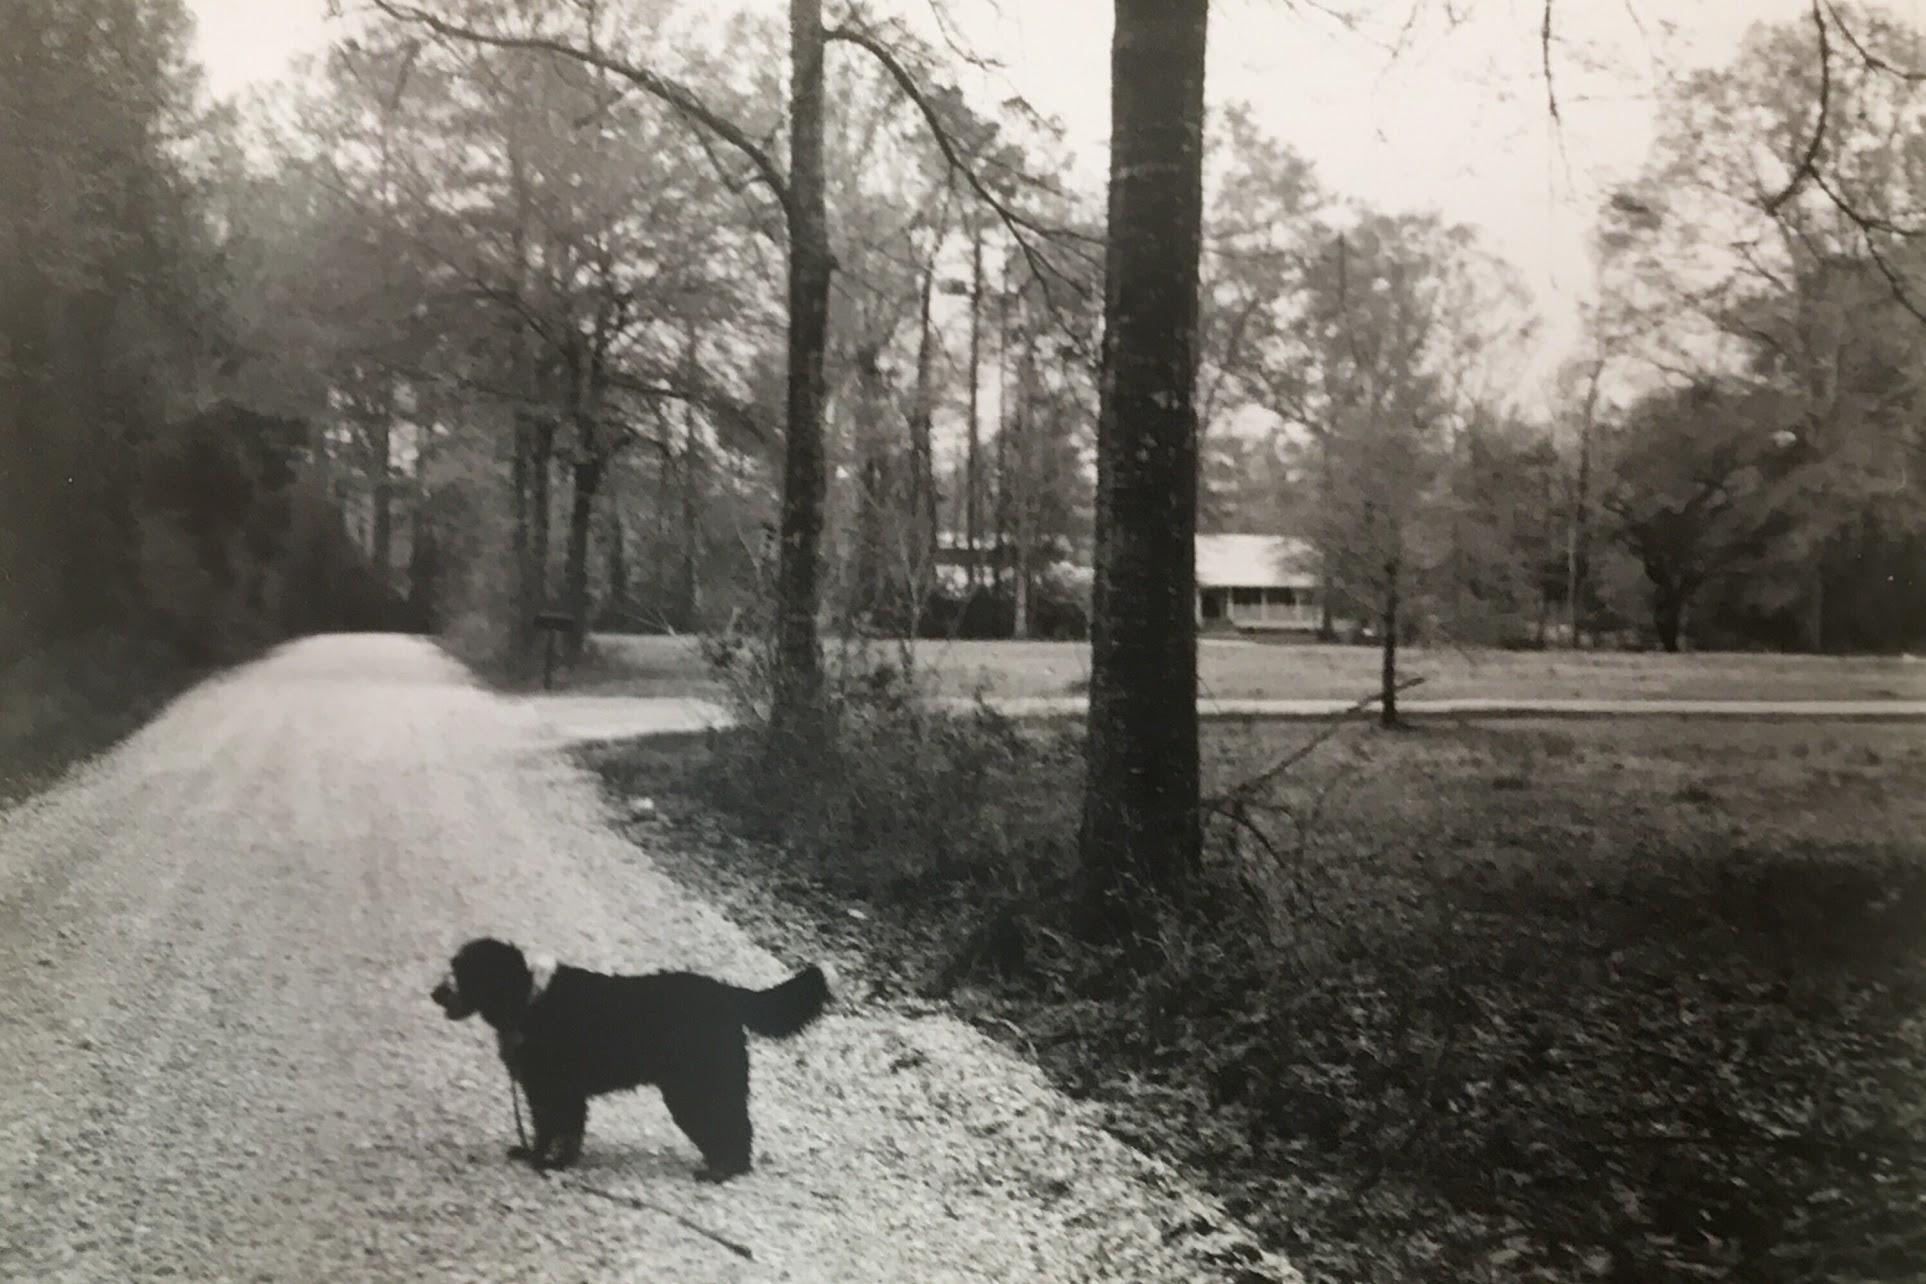 Dog walks on a gravel road